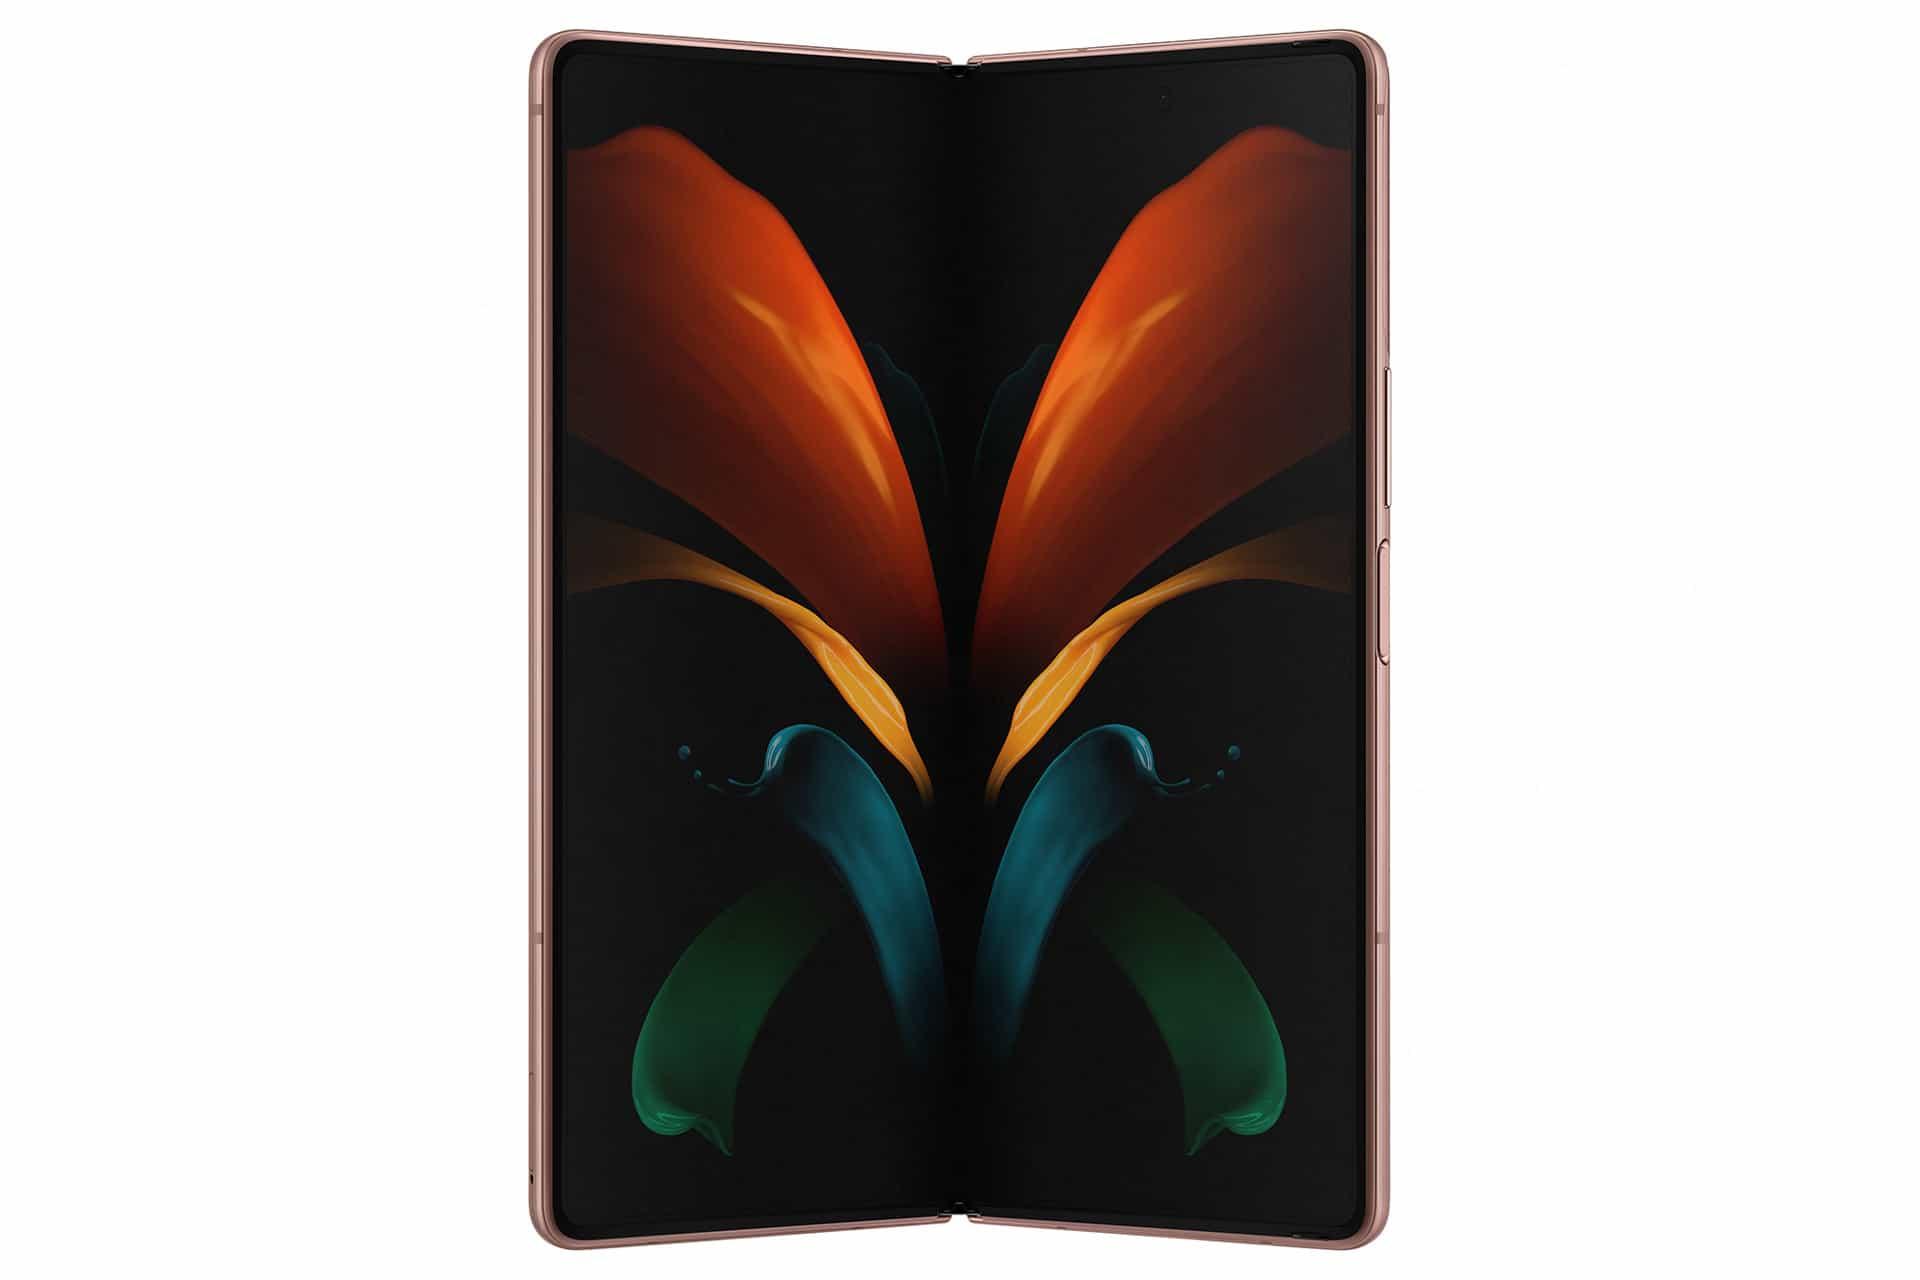 Samsung Galaxy Z Fold 2 press 4